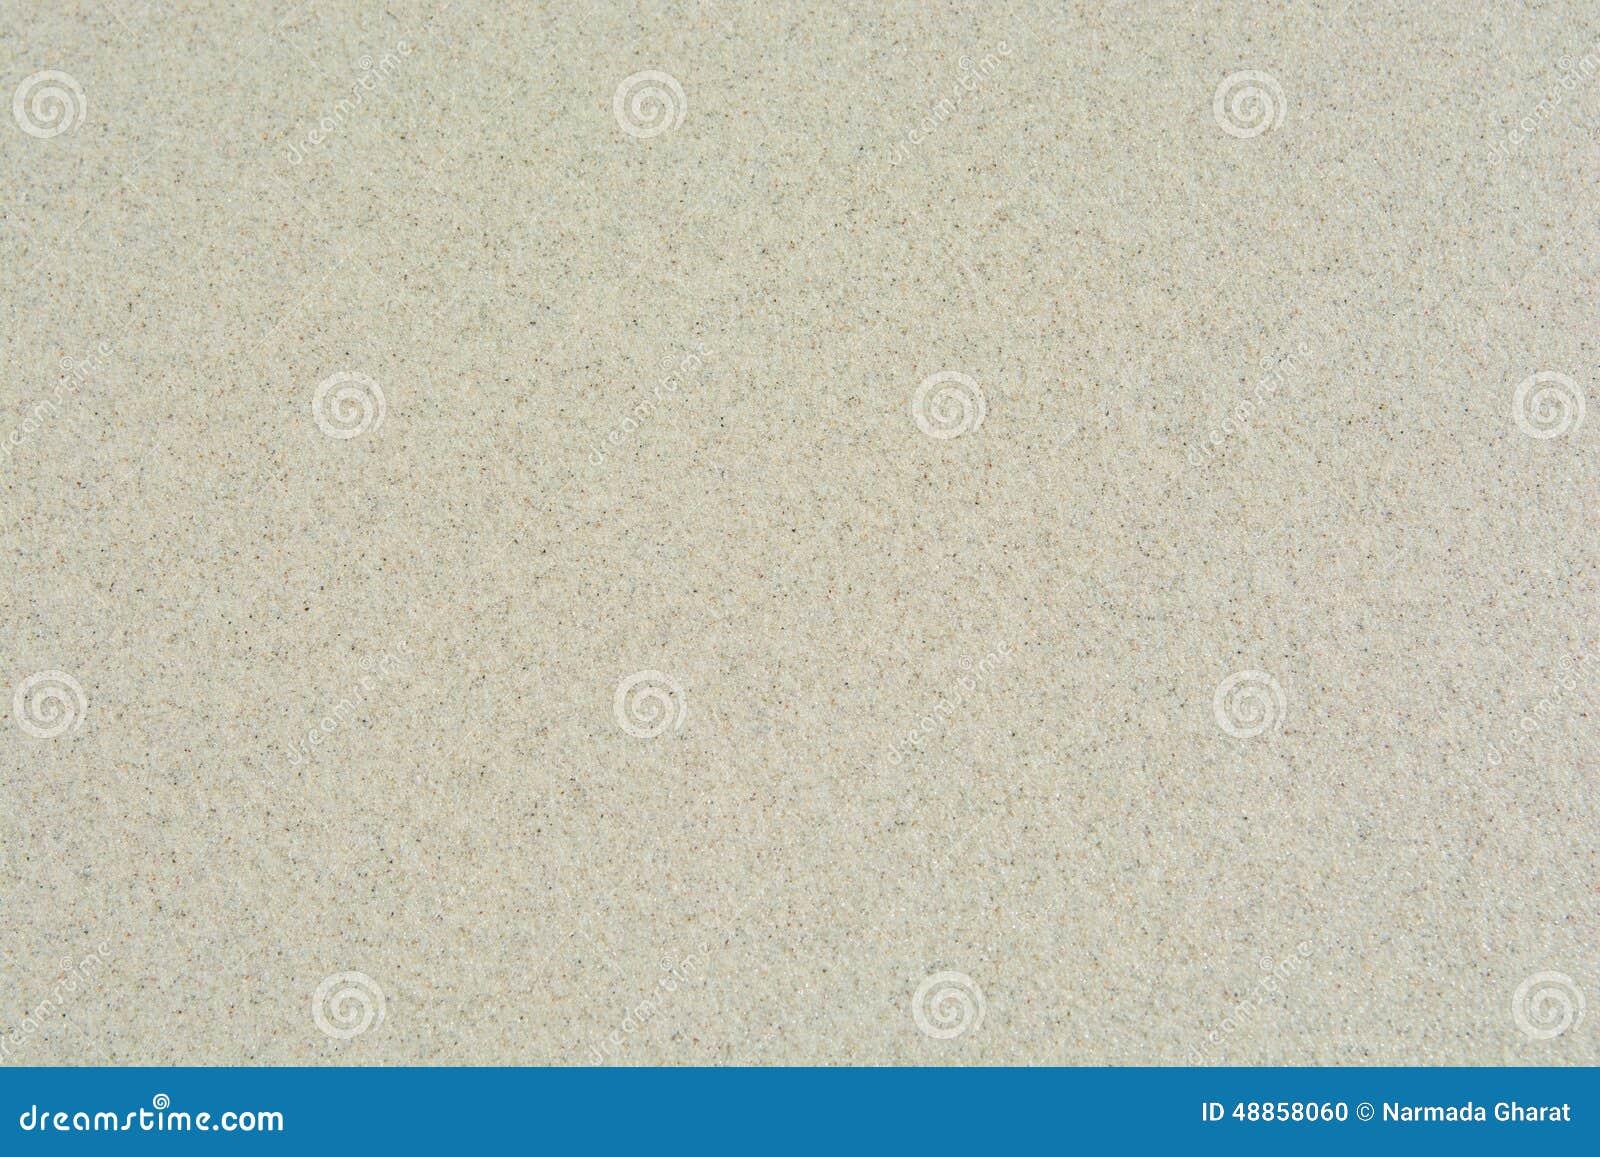 White Sand Beach Texture Background